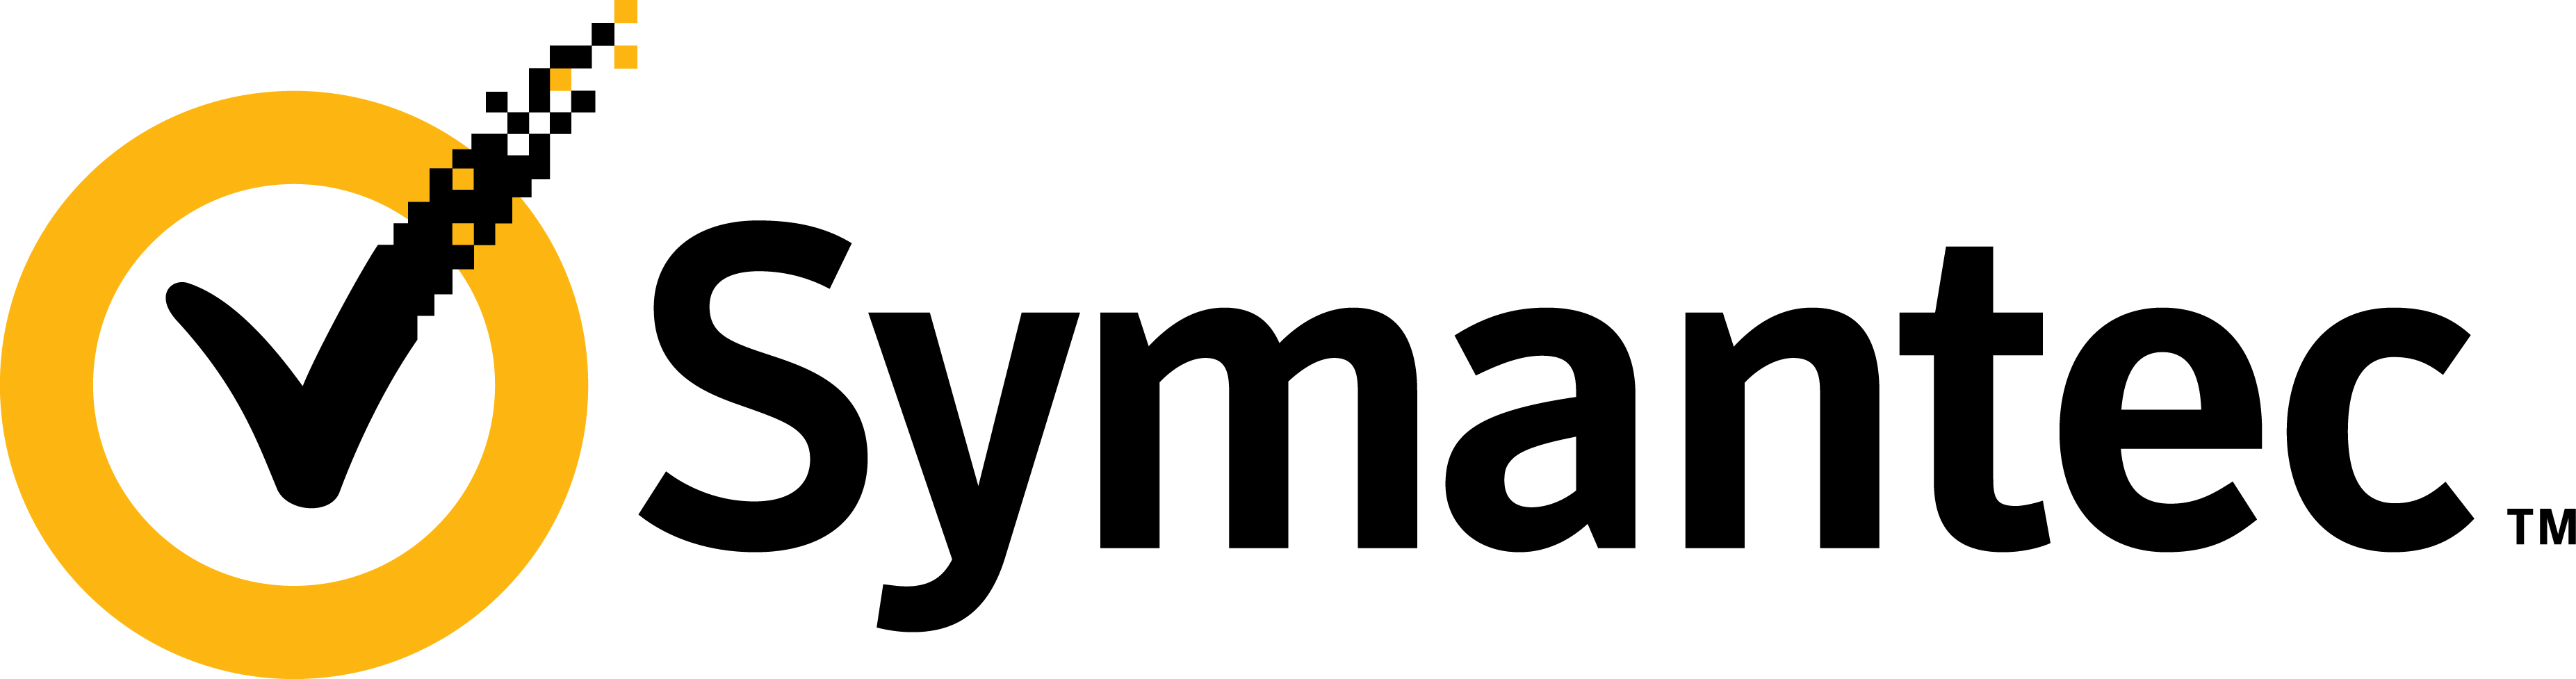 Symantecs logo